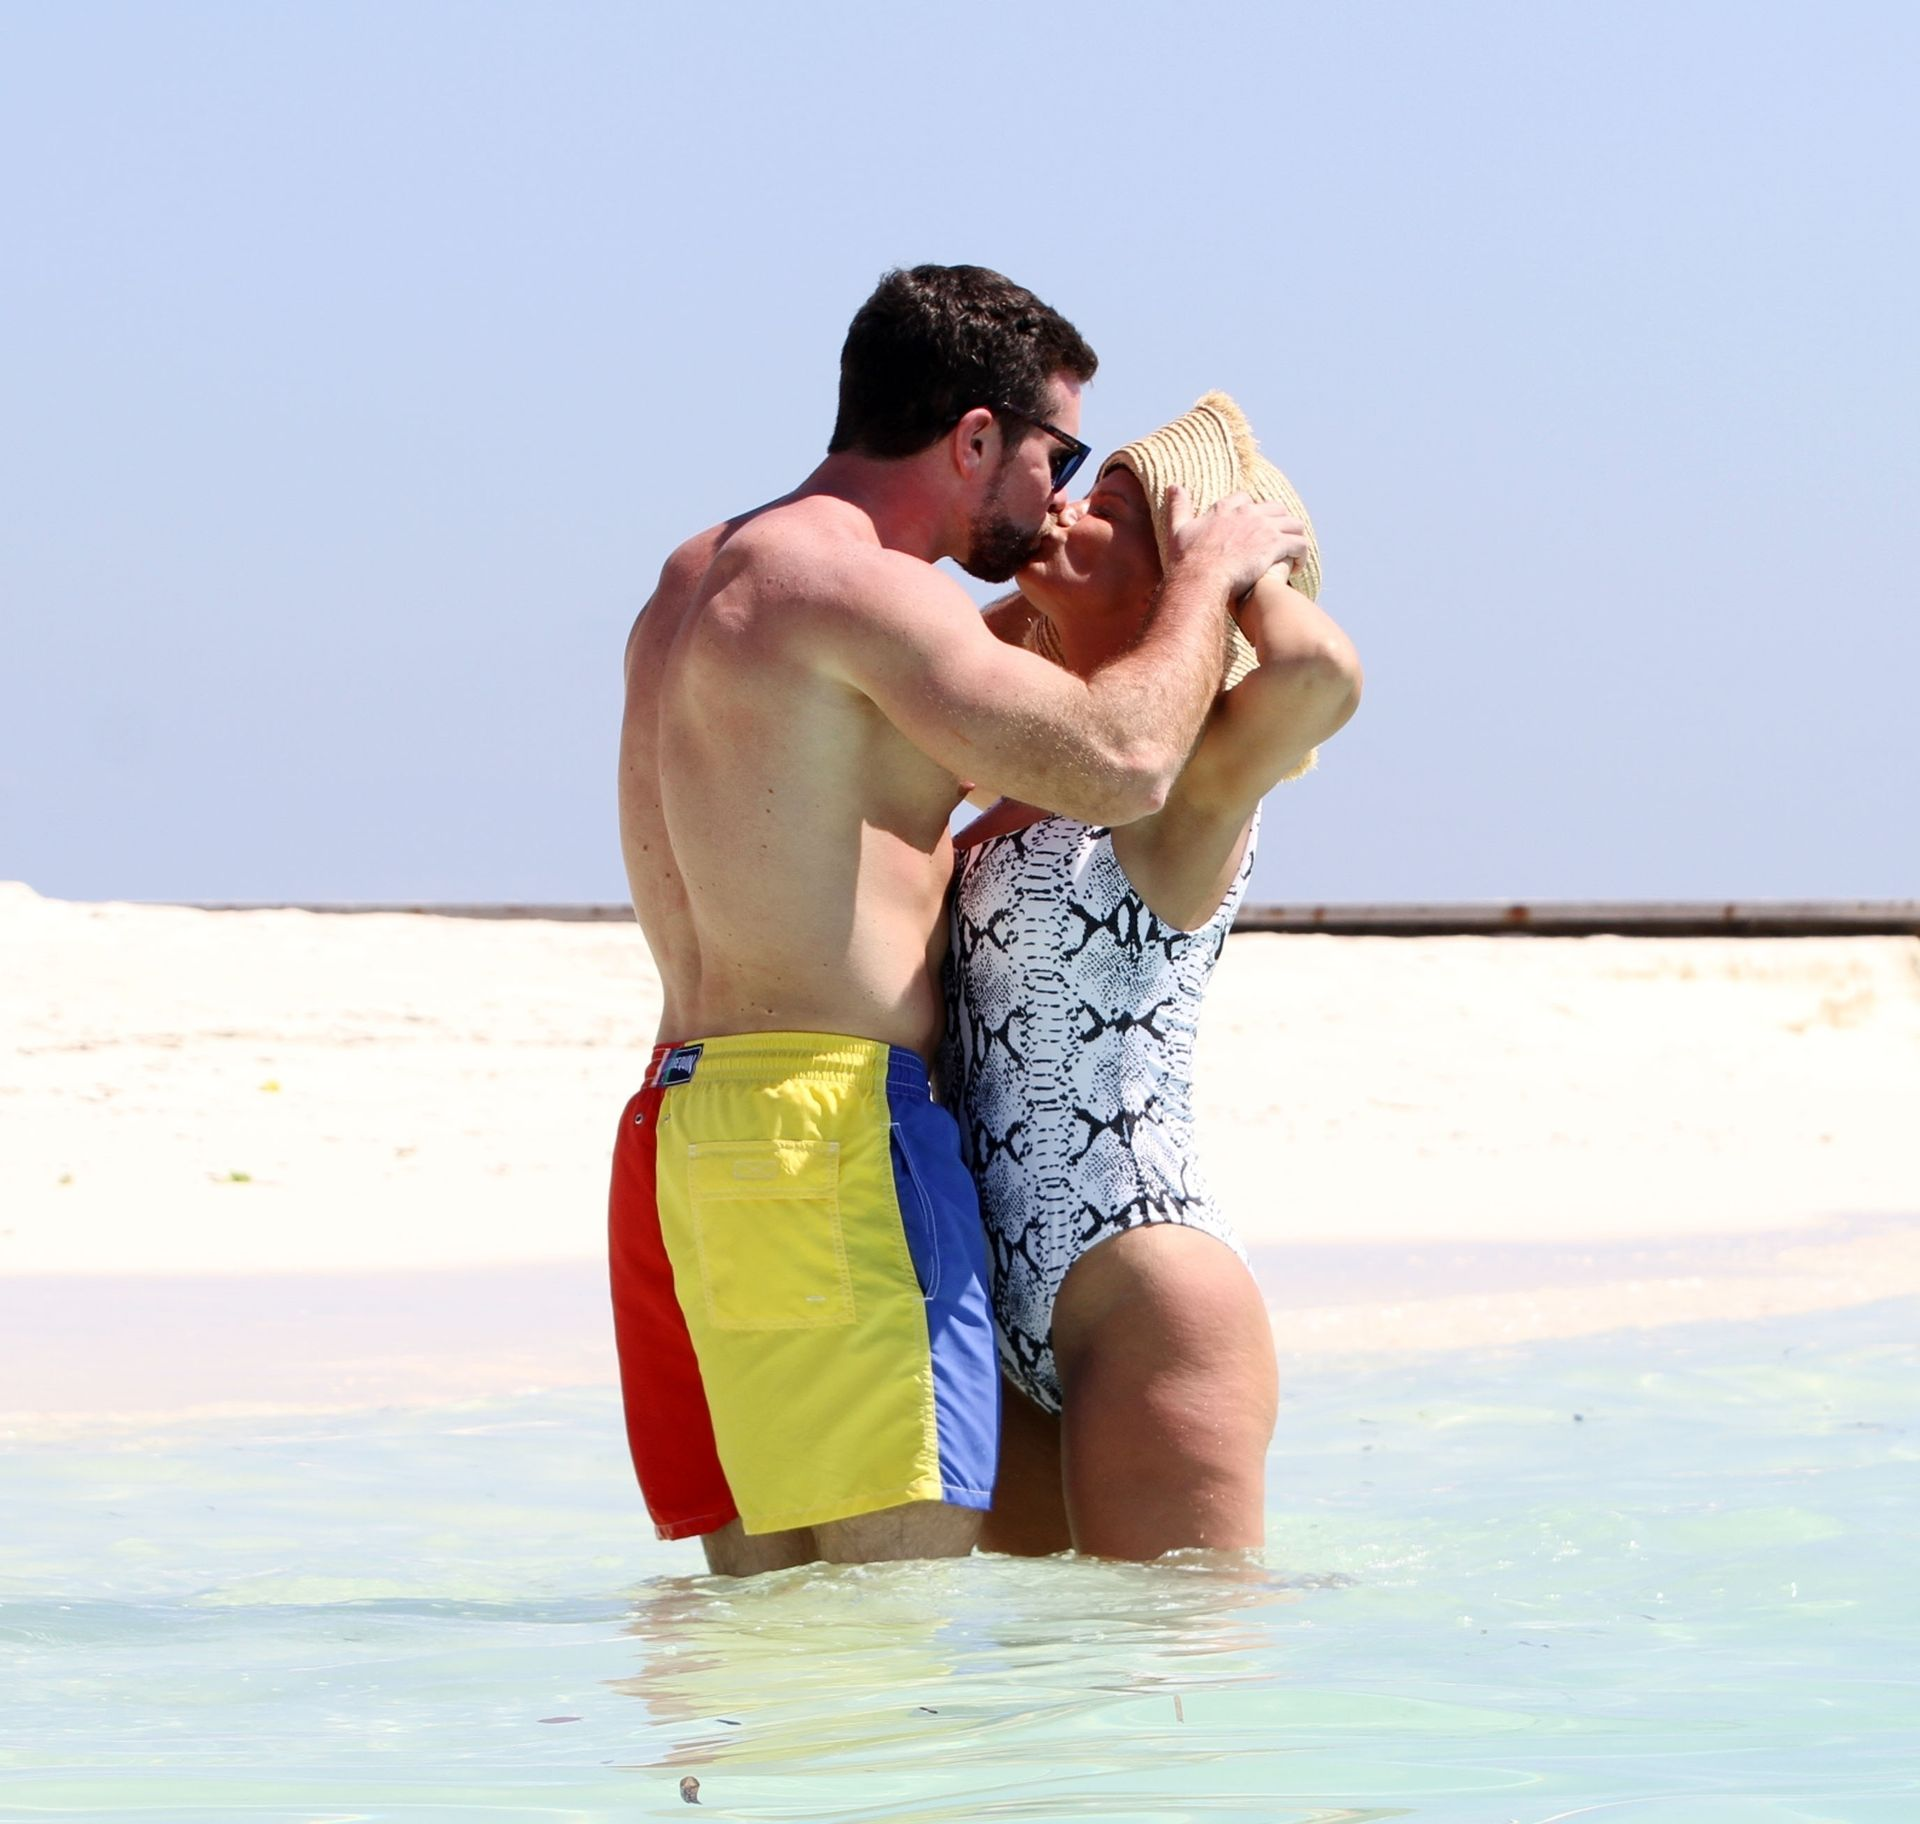 Kerry Katona & Ryan Mahoney Hit The Beach On Holiday At Their Luxury 5 Star Resort Ayada Maldives 0021